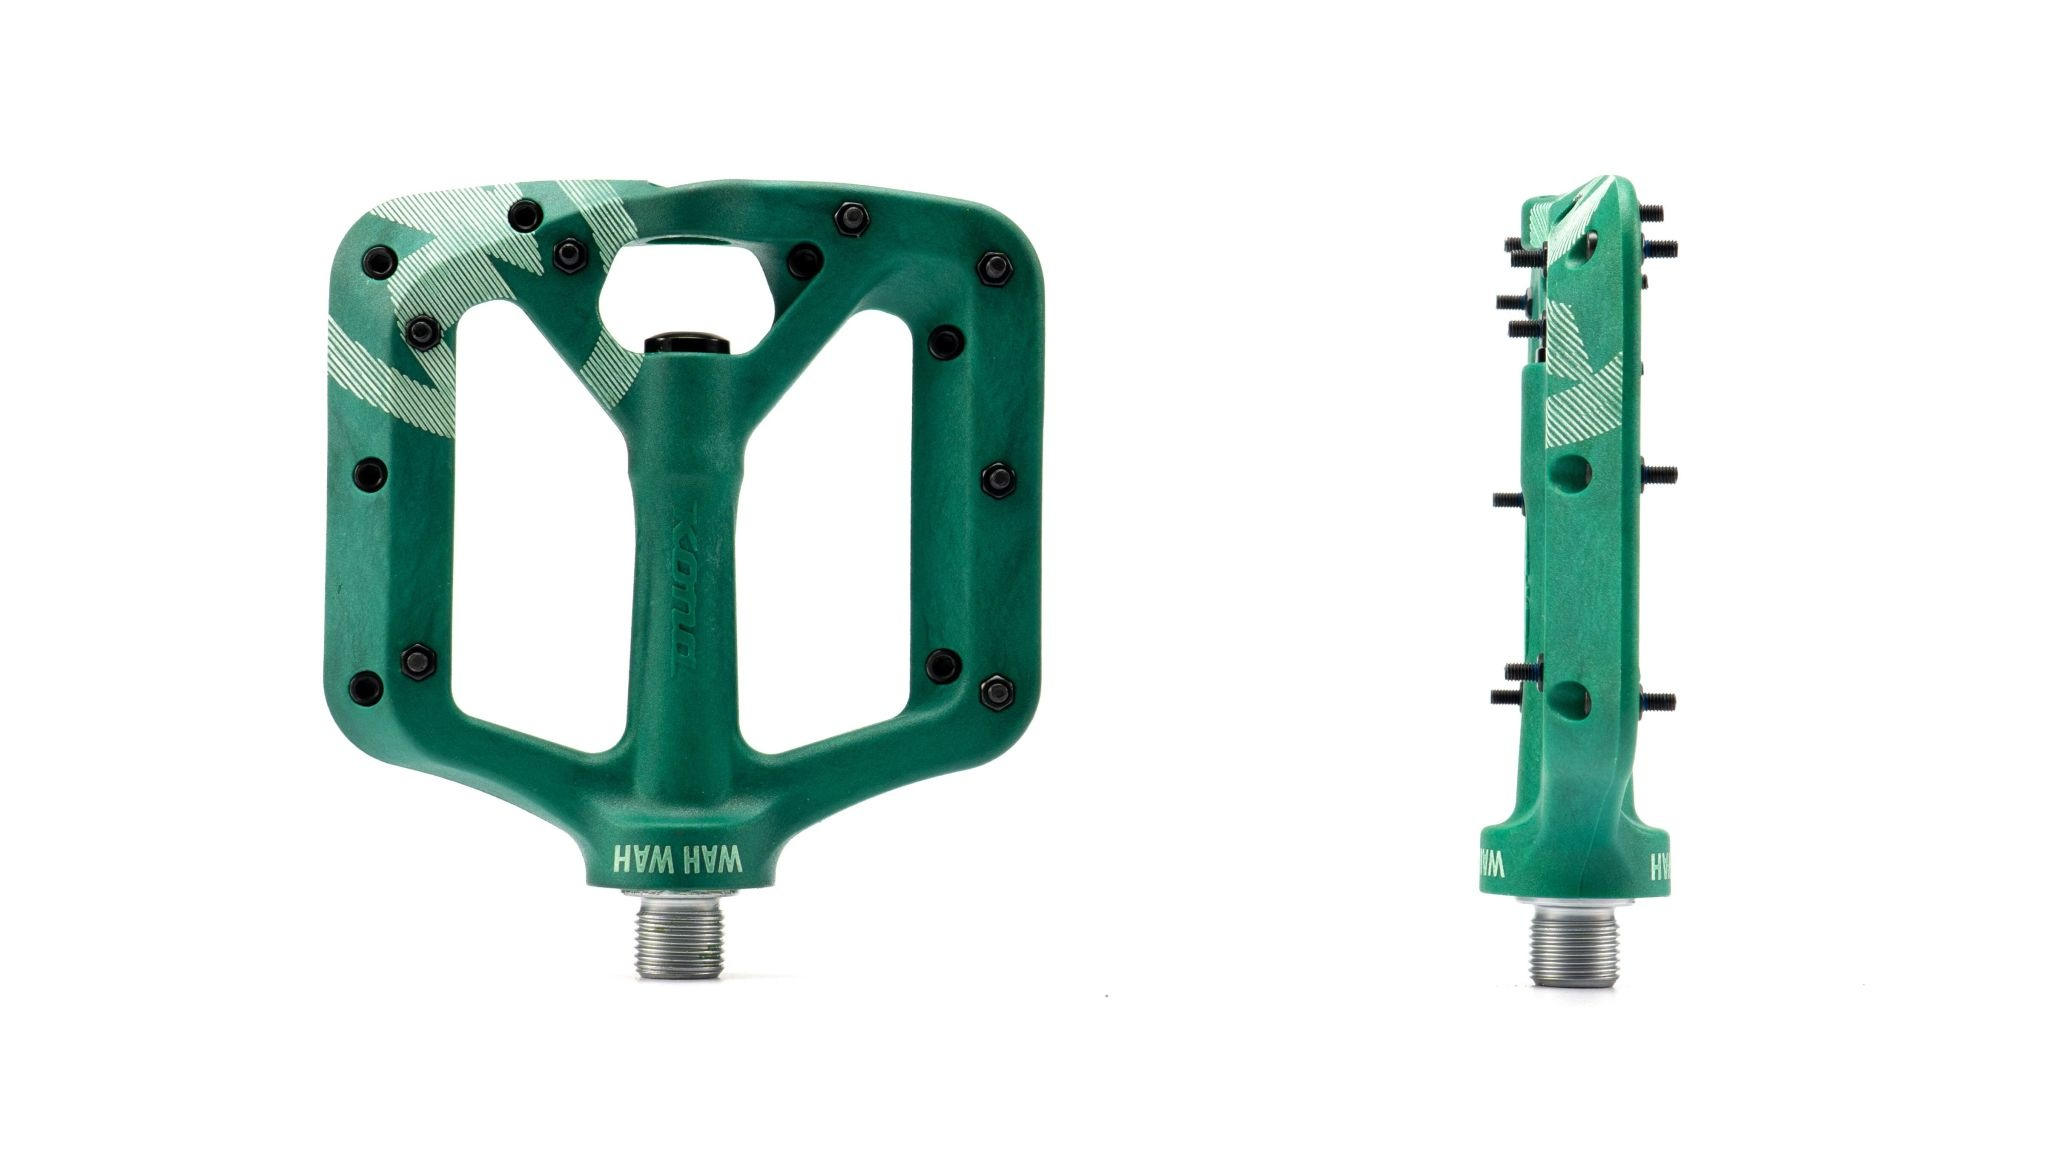 Kona Wah Wah Small Dark Green Composite Pedals